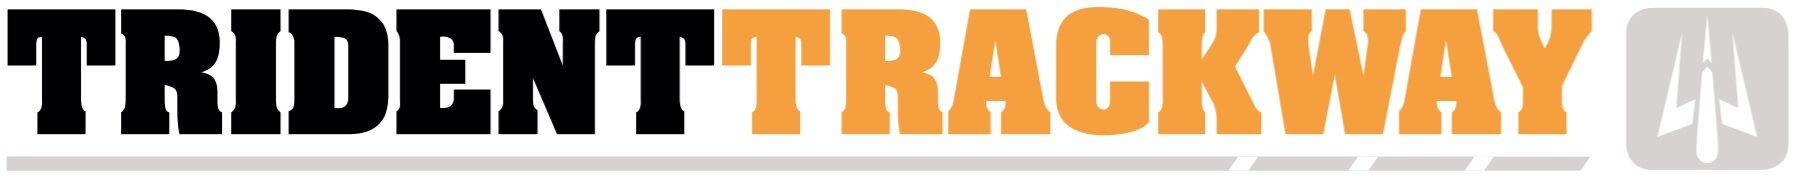 Trident Trackway